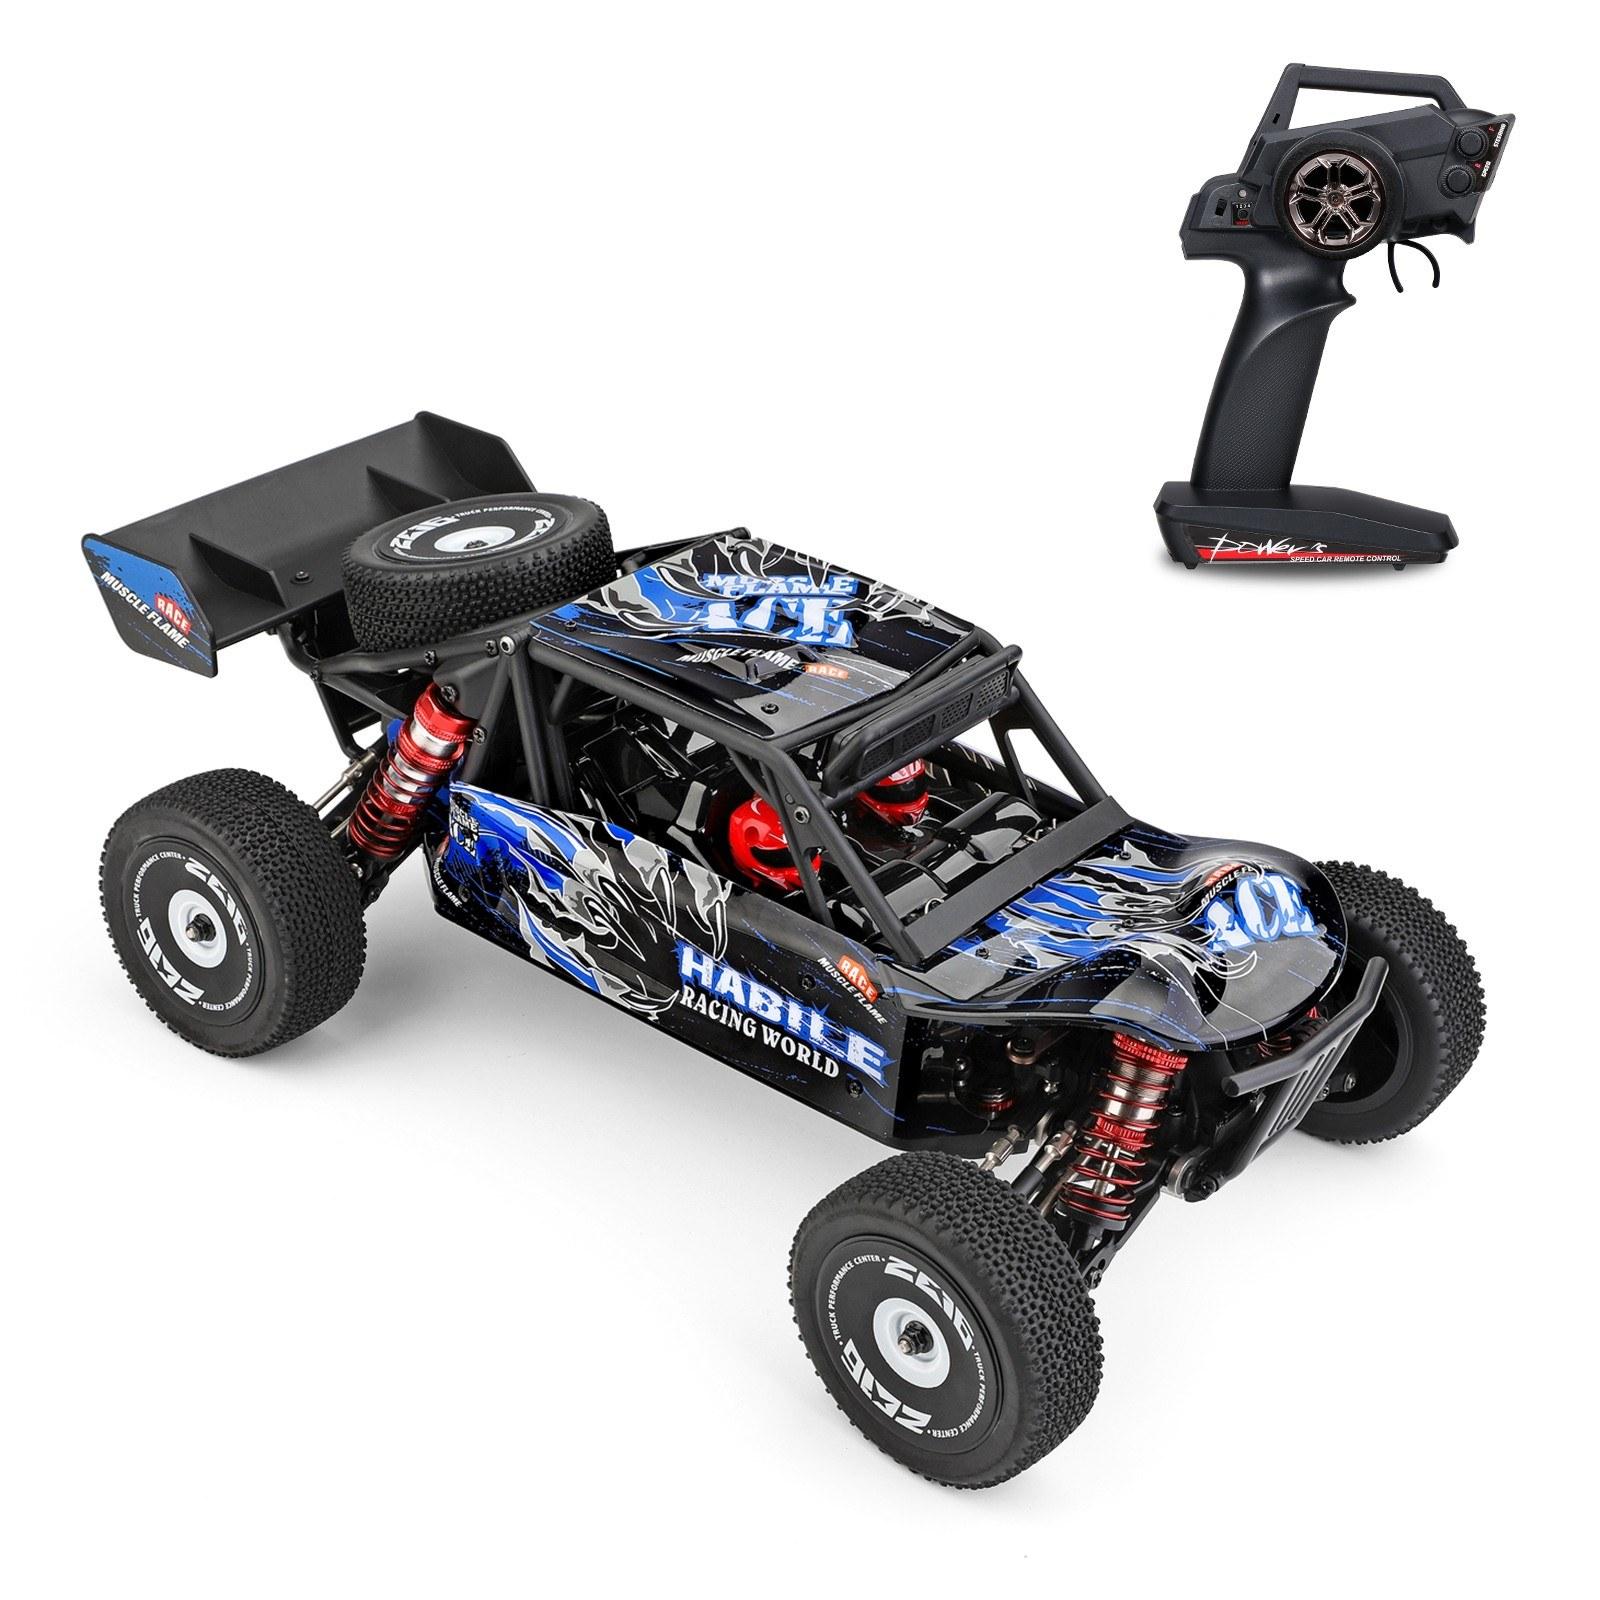 tomtop.com - [EU Warehouse] Wltoys 124018 1/12 2.4GHz 60km/h Racing Car, $99.99 (Inclusive of VAT)